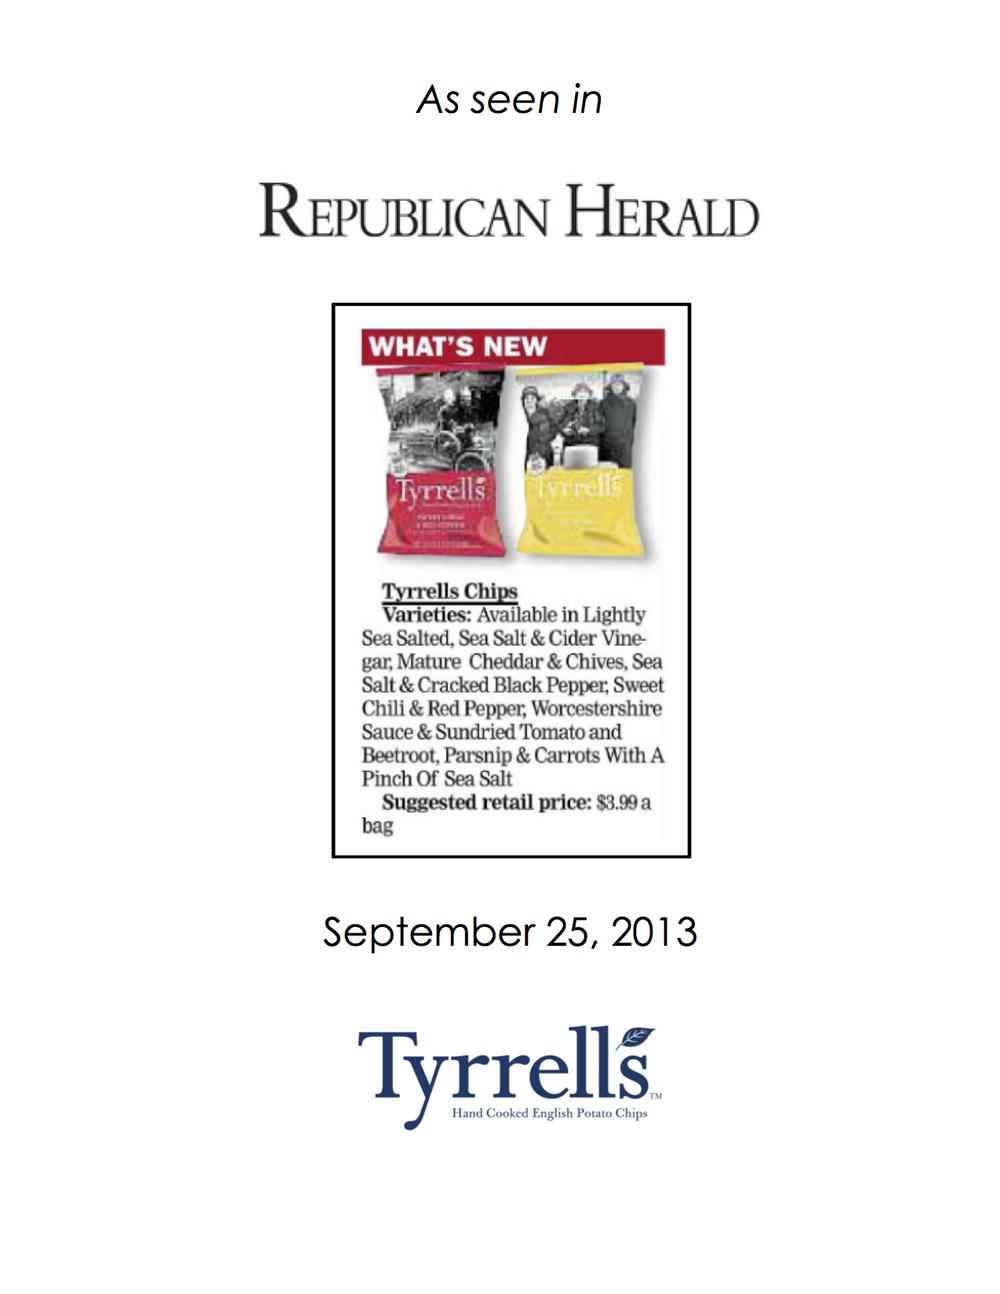 tyrrells-asseenin-republicanherald copy.jpg